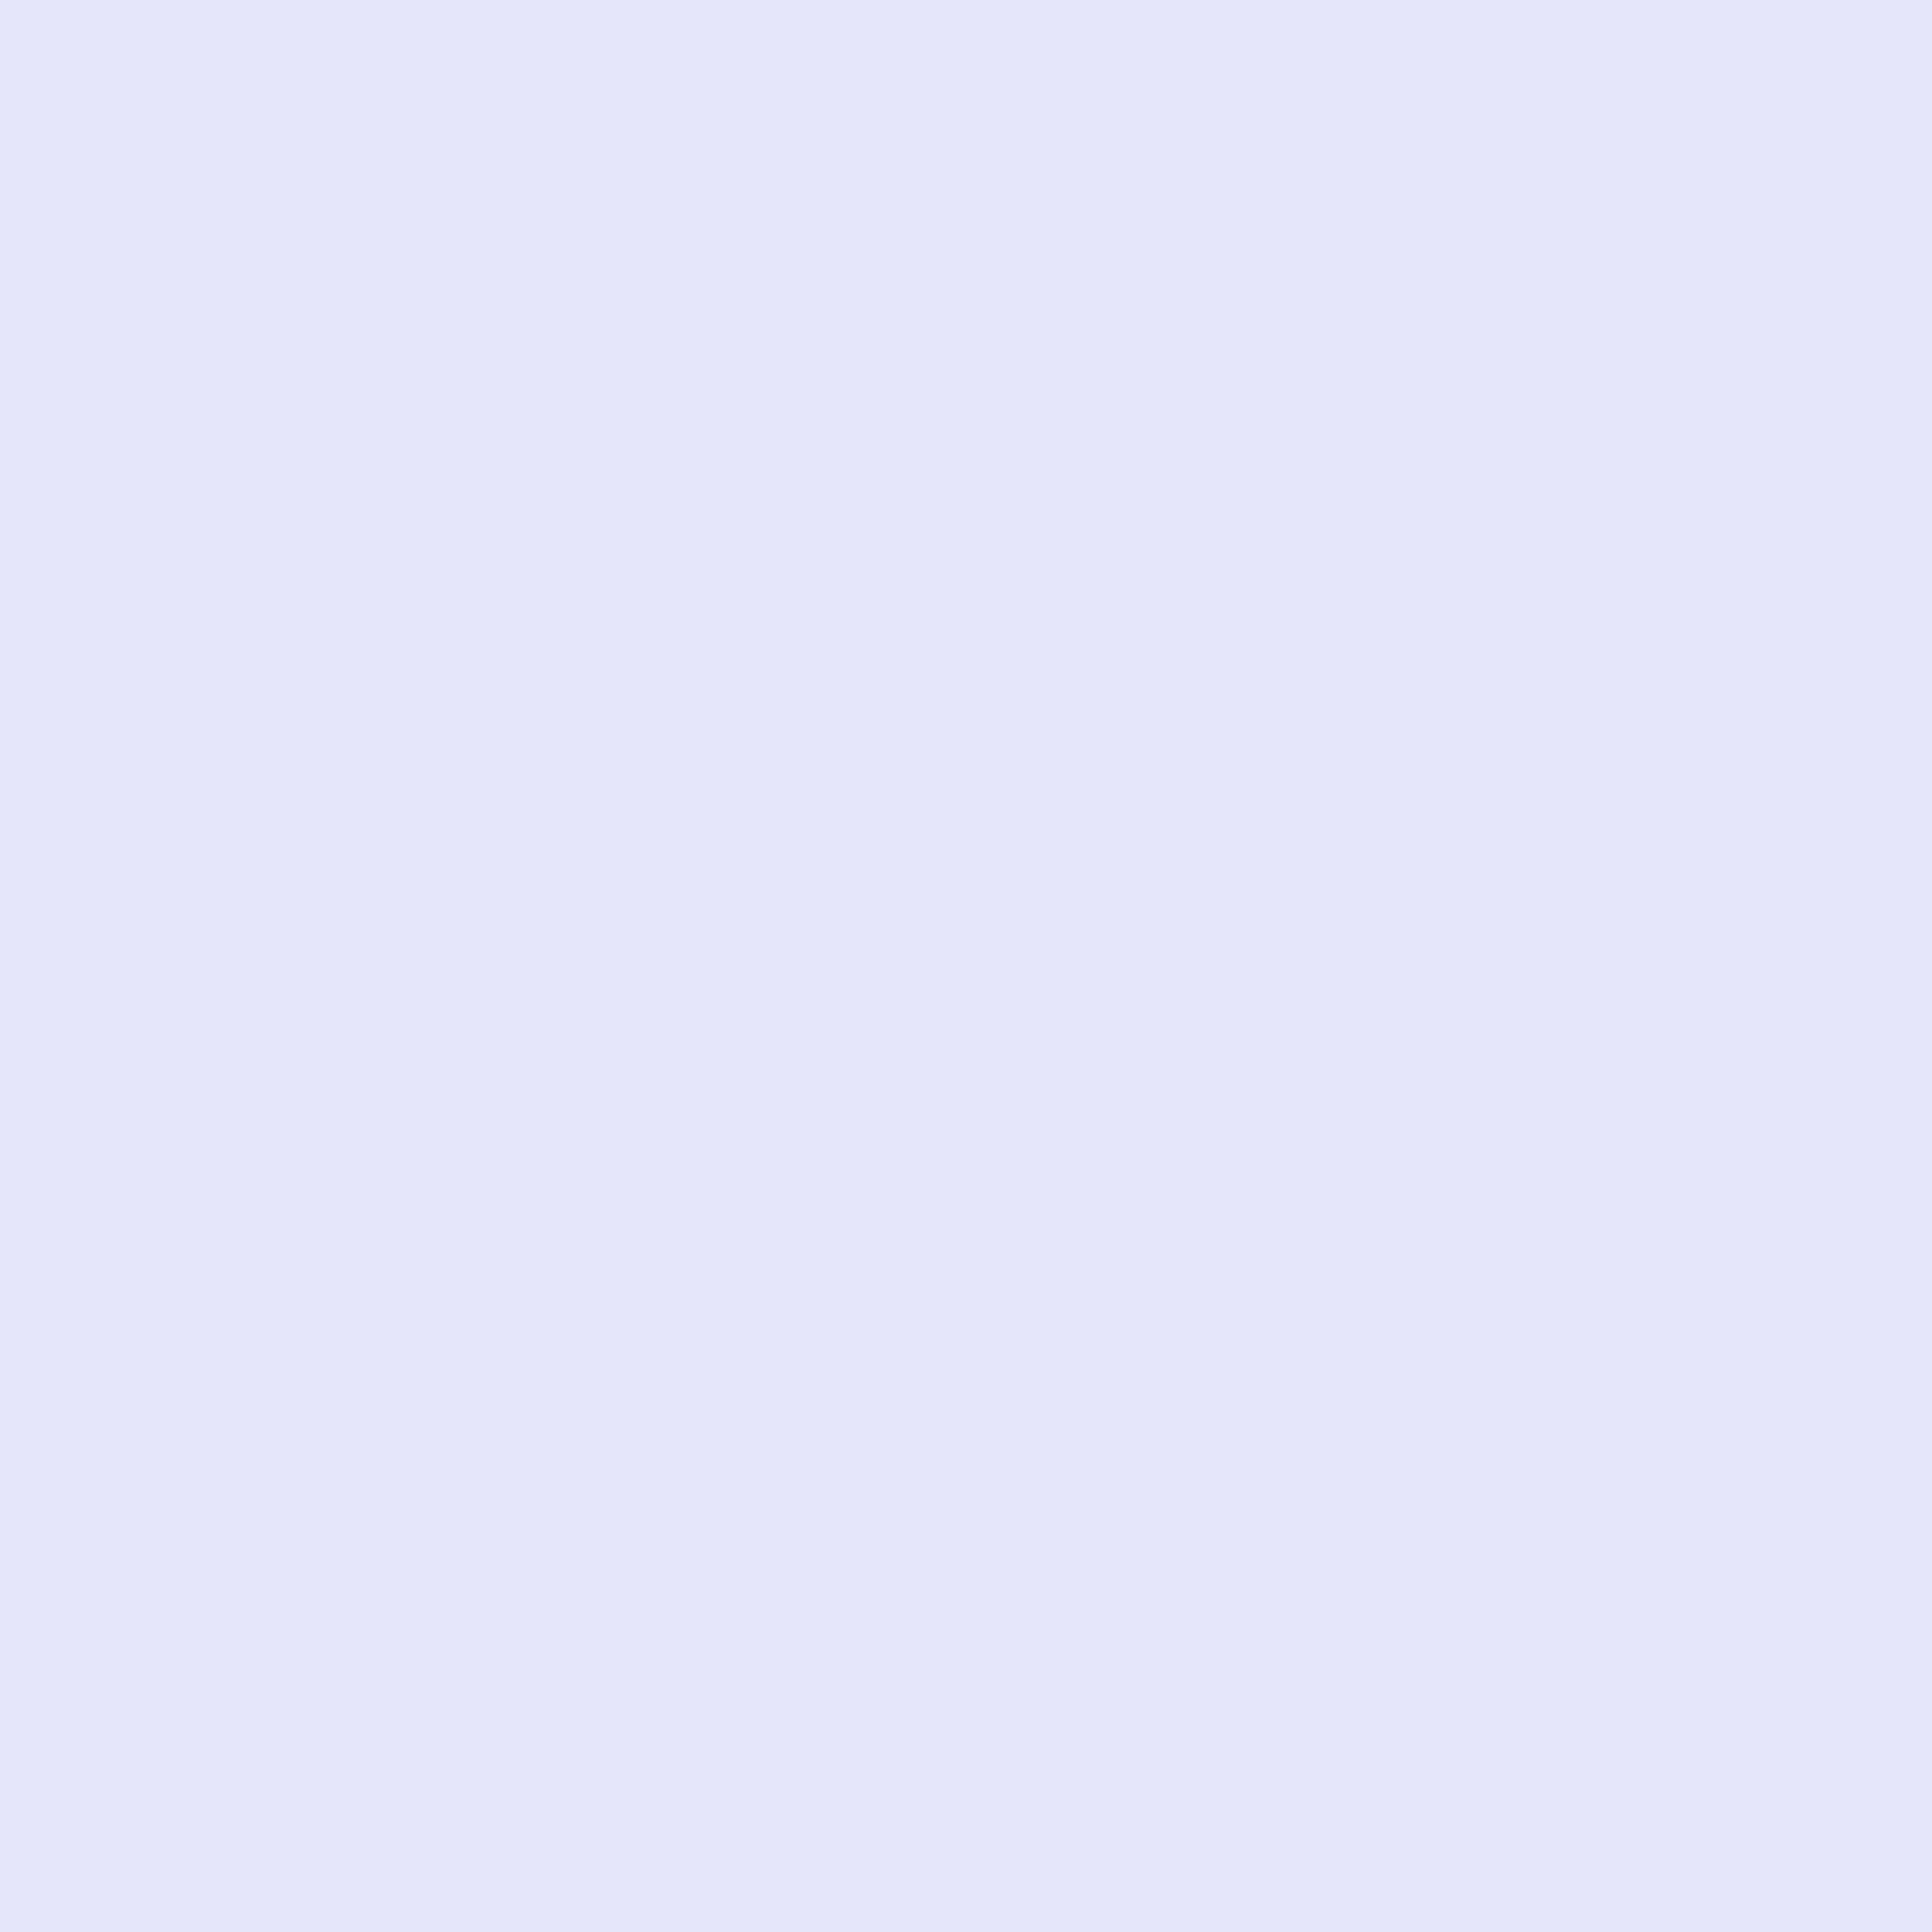 2048x2048 Lavender Web Solid Color Background